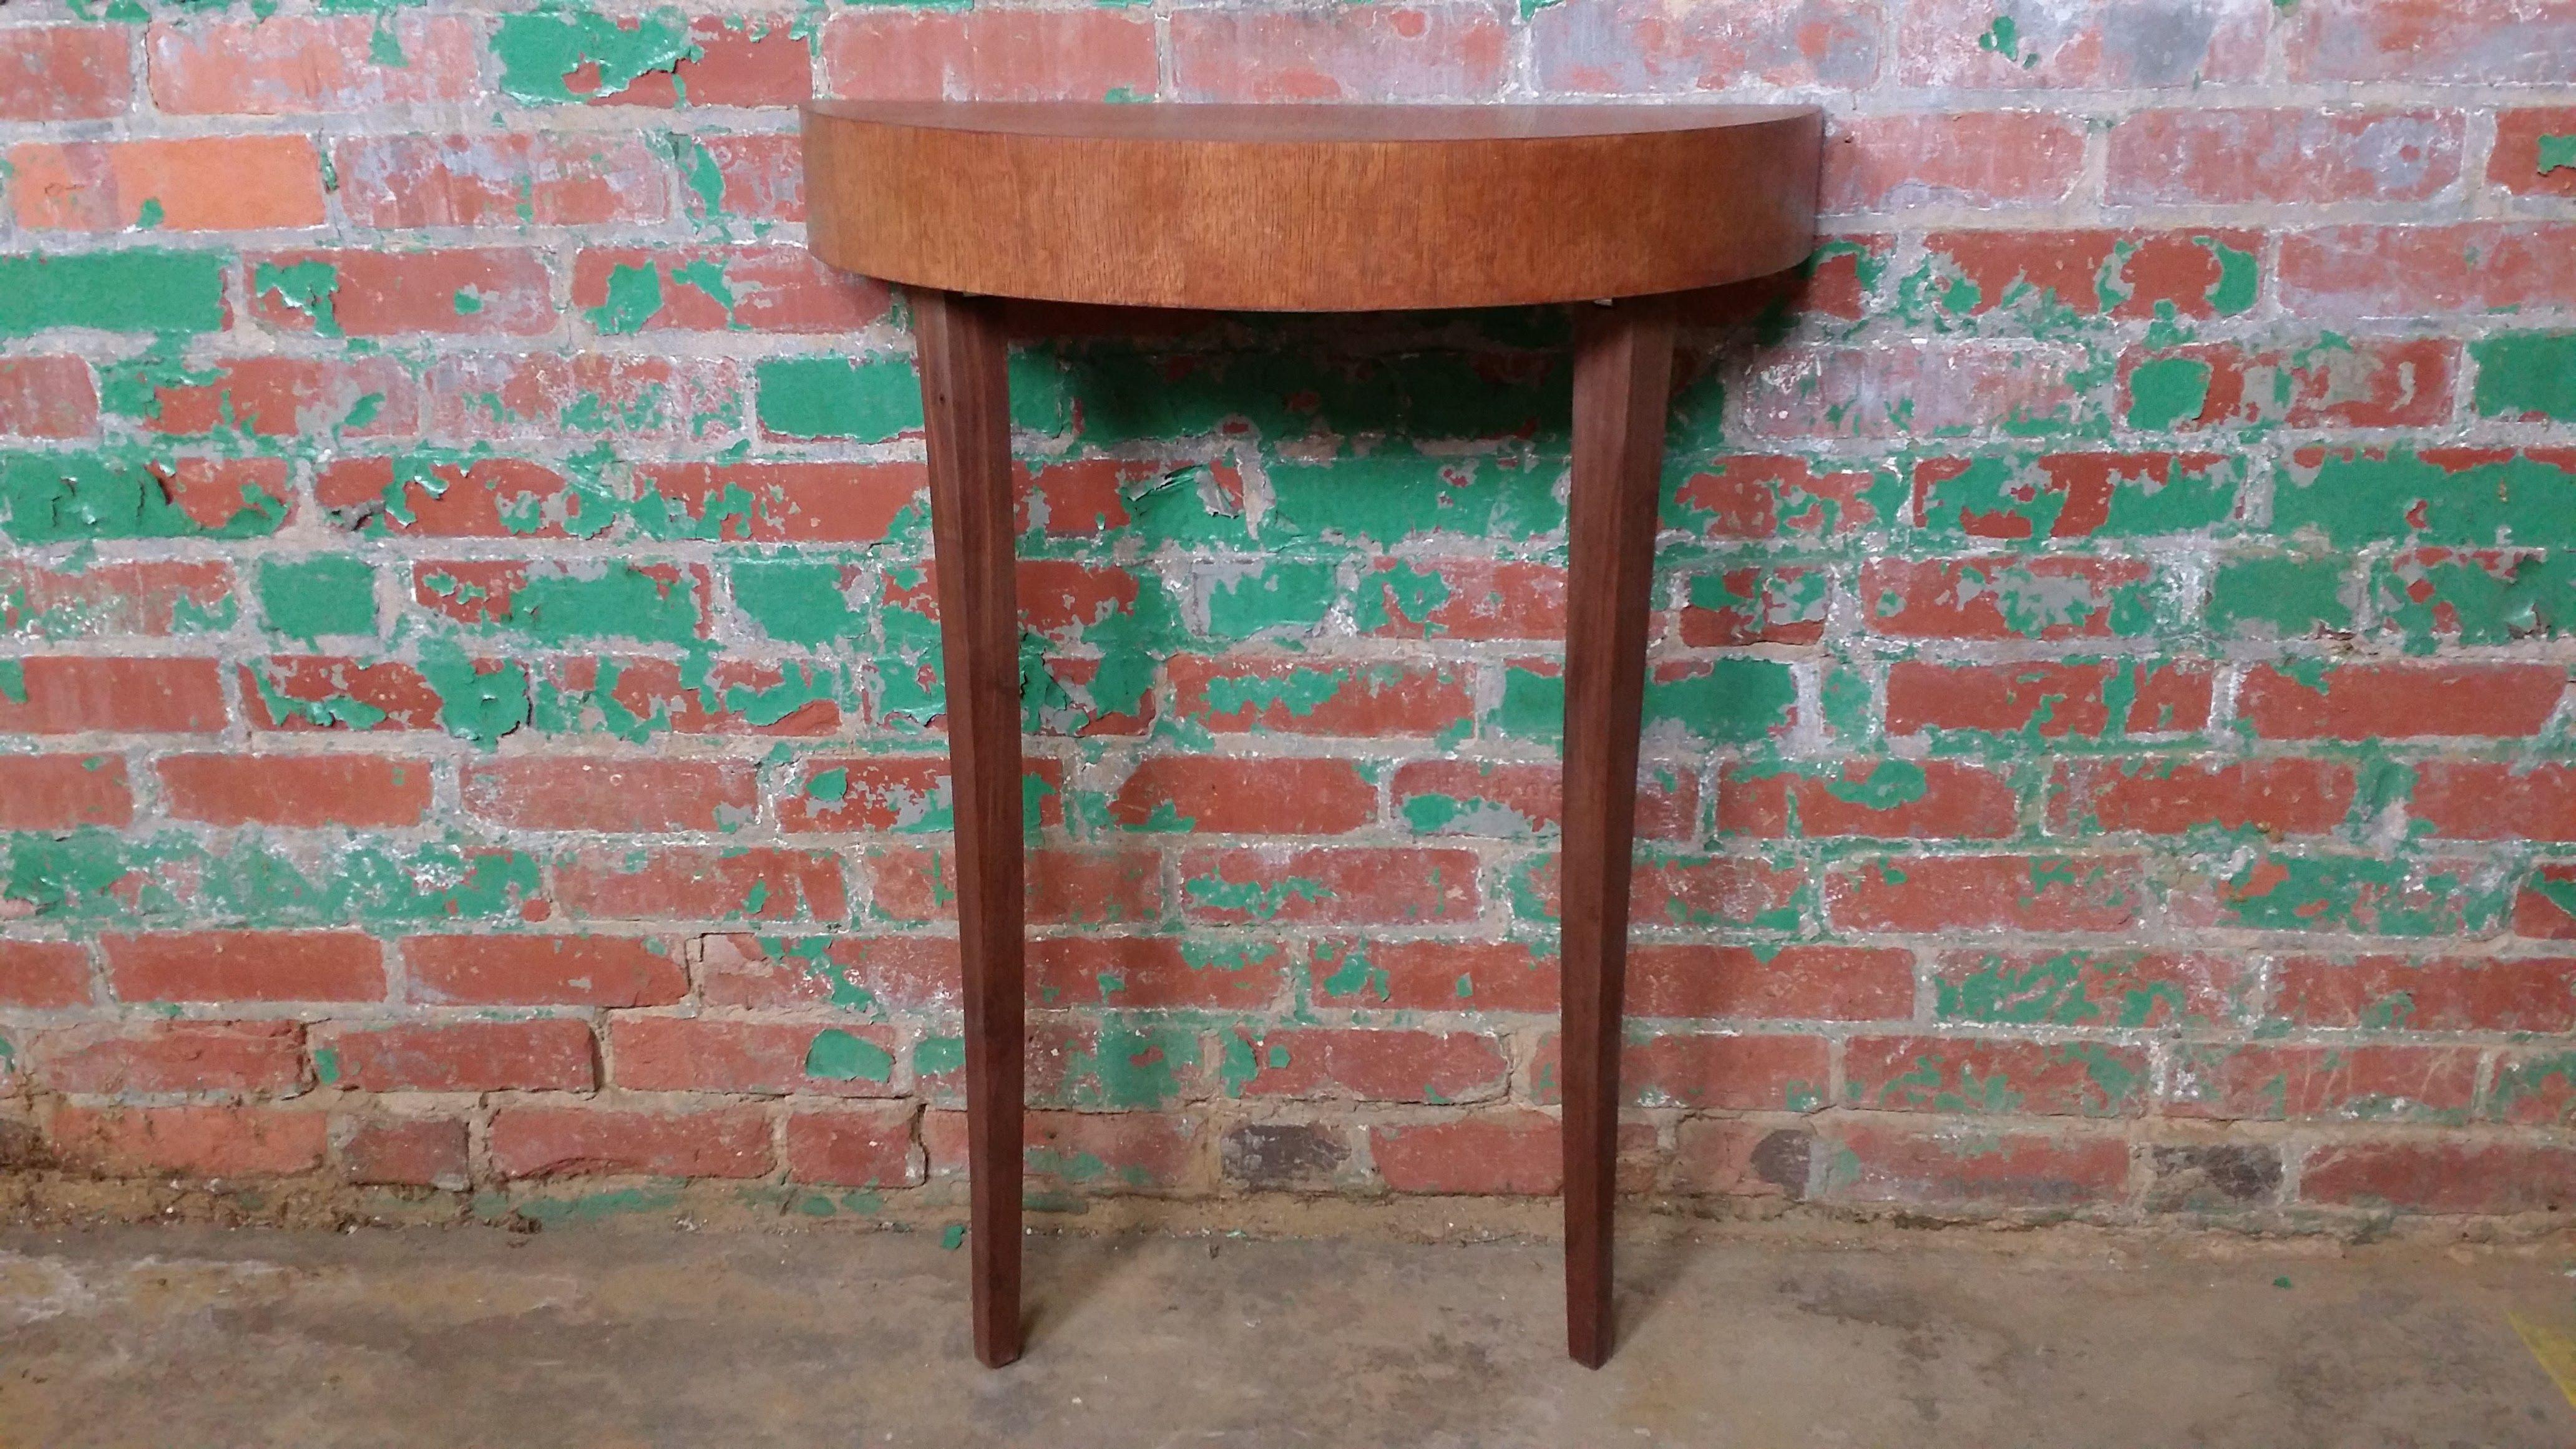 Custom Made Two Legged Leaning Console Table Quarter Sawn Oak And Black Walnut